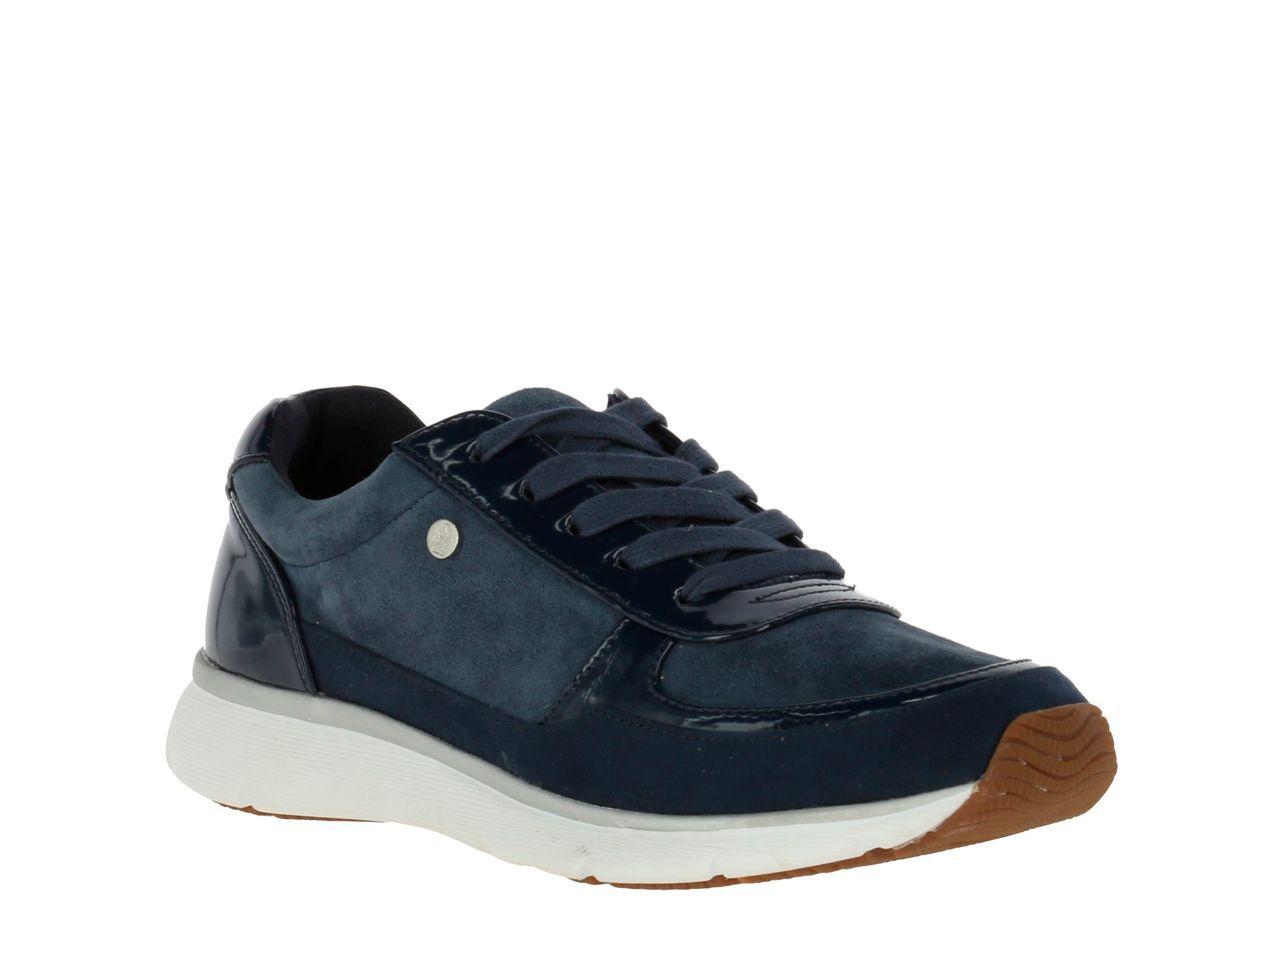 Zapatilla Mujer Lovit Hush puppies, Shoes, Sneakers